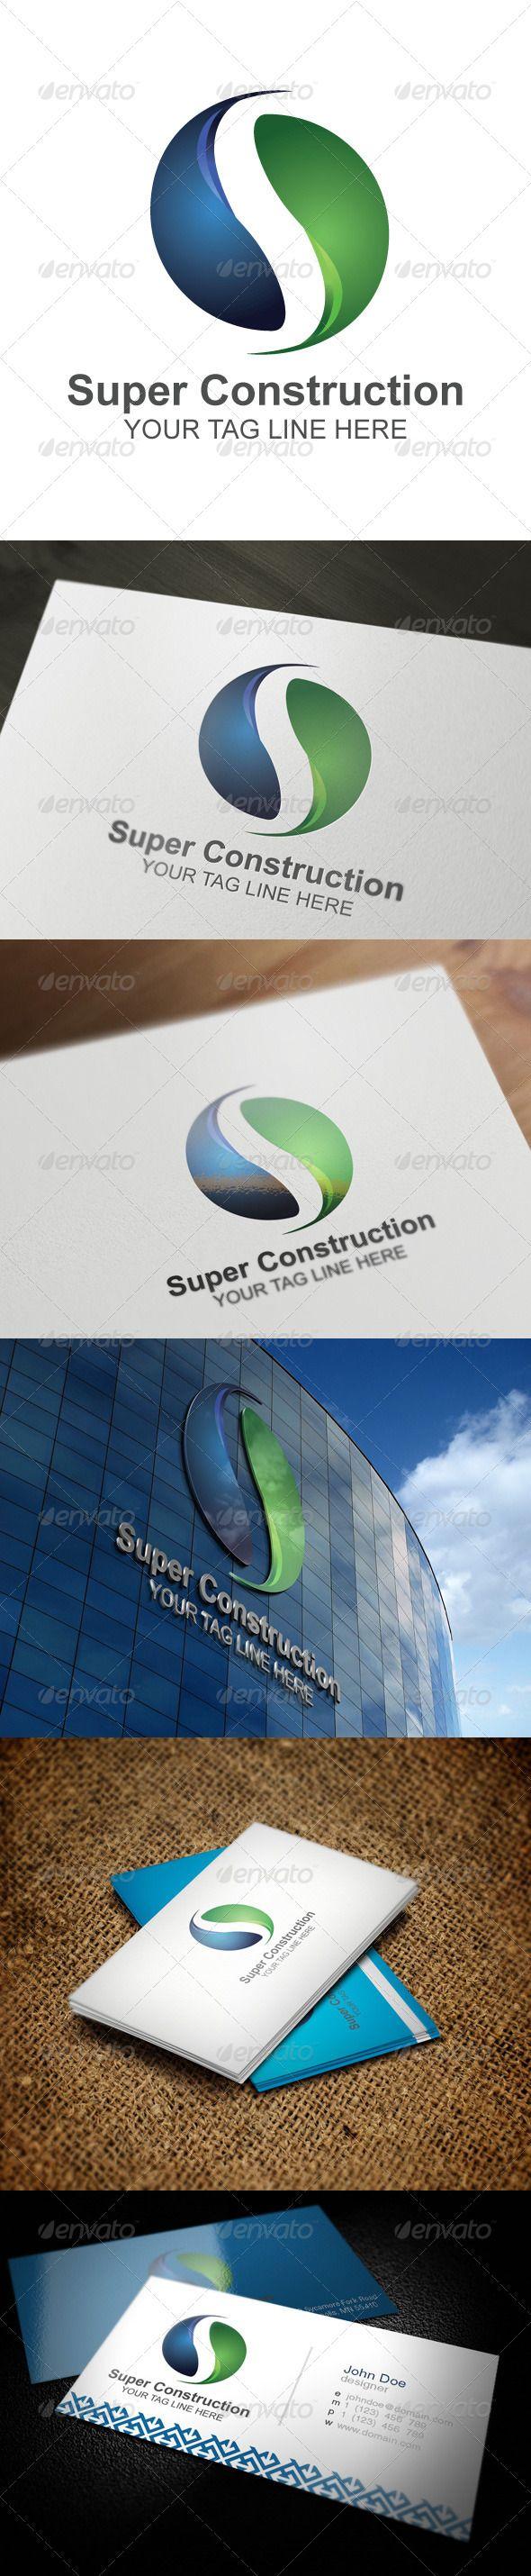 Super Construction Logo Design Template Vector #logotype Download it here:  http://graphicriver.net/item/super-construction/5540408?s_rank=1068?ref=nexion